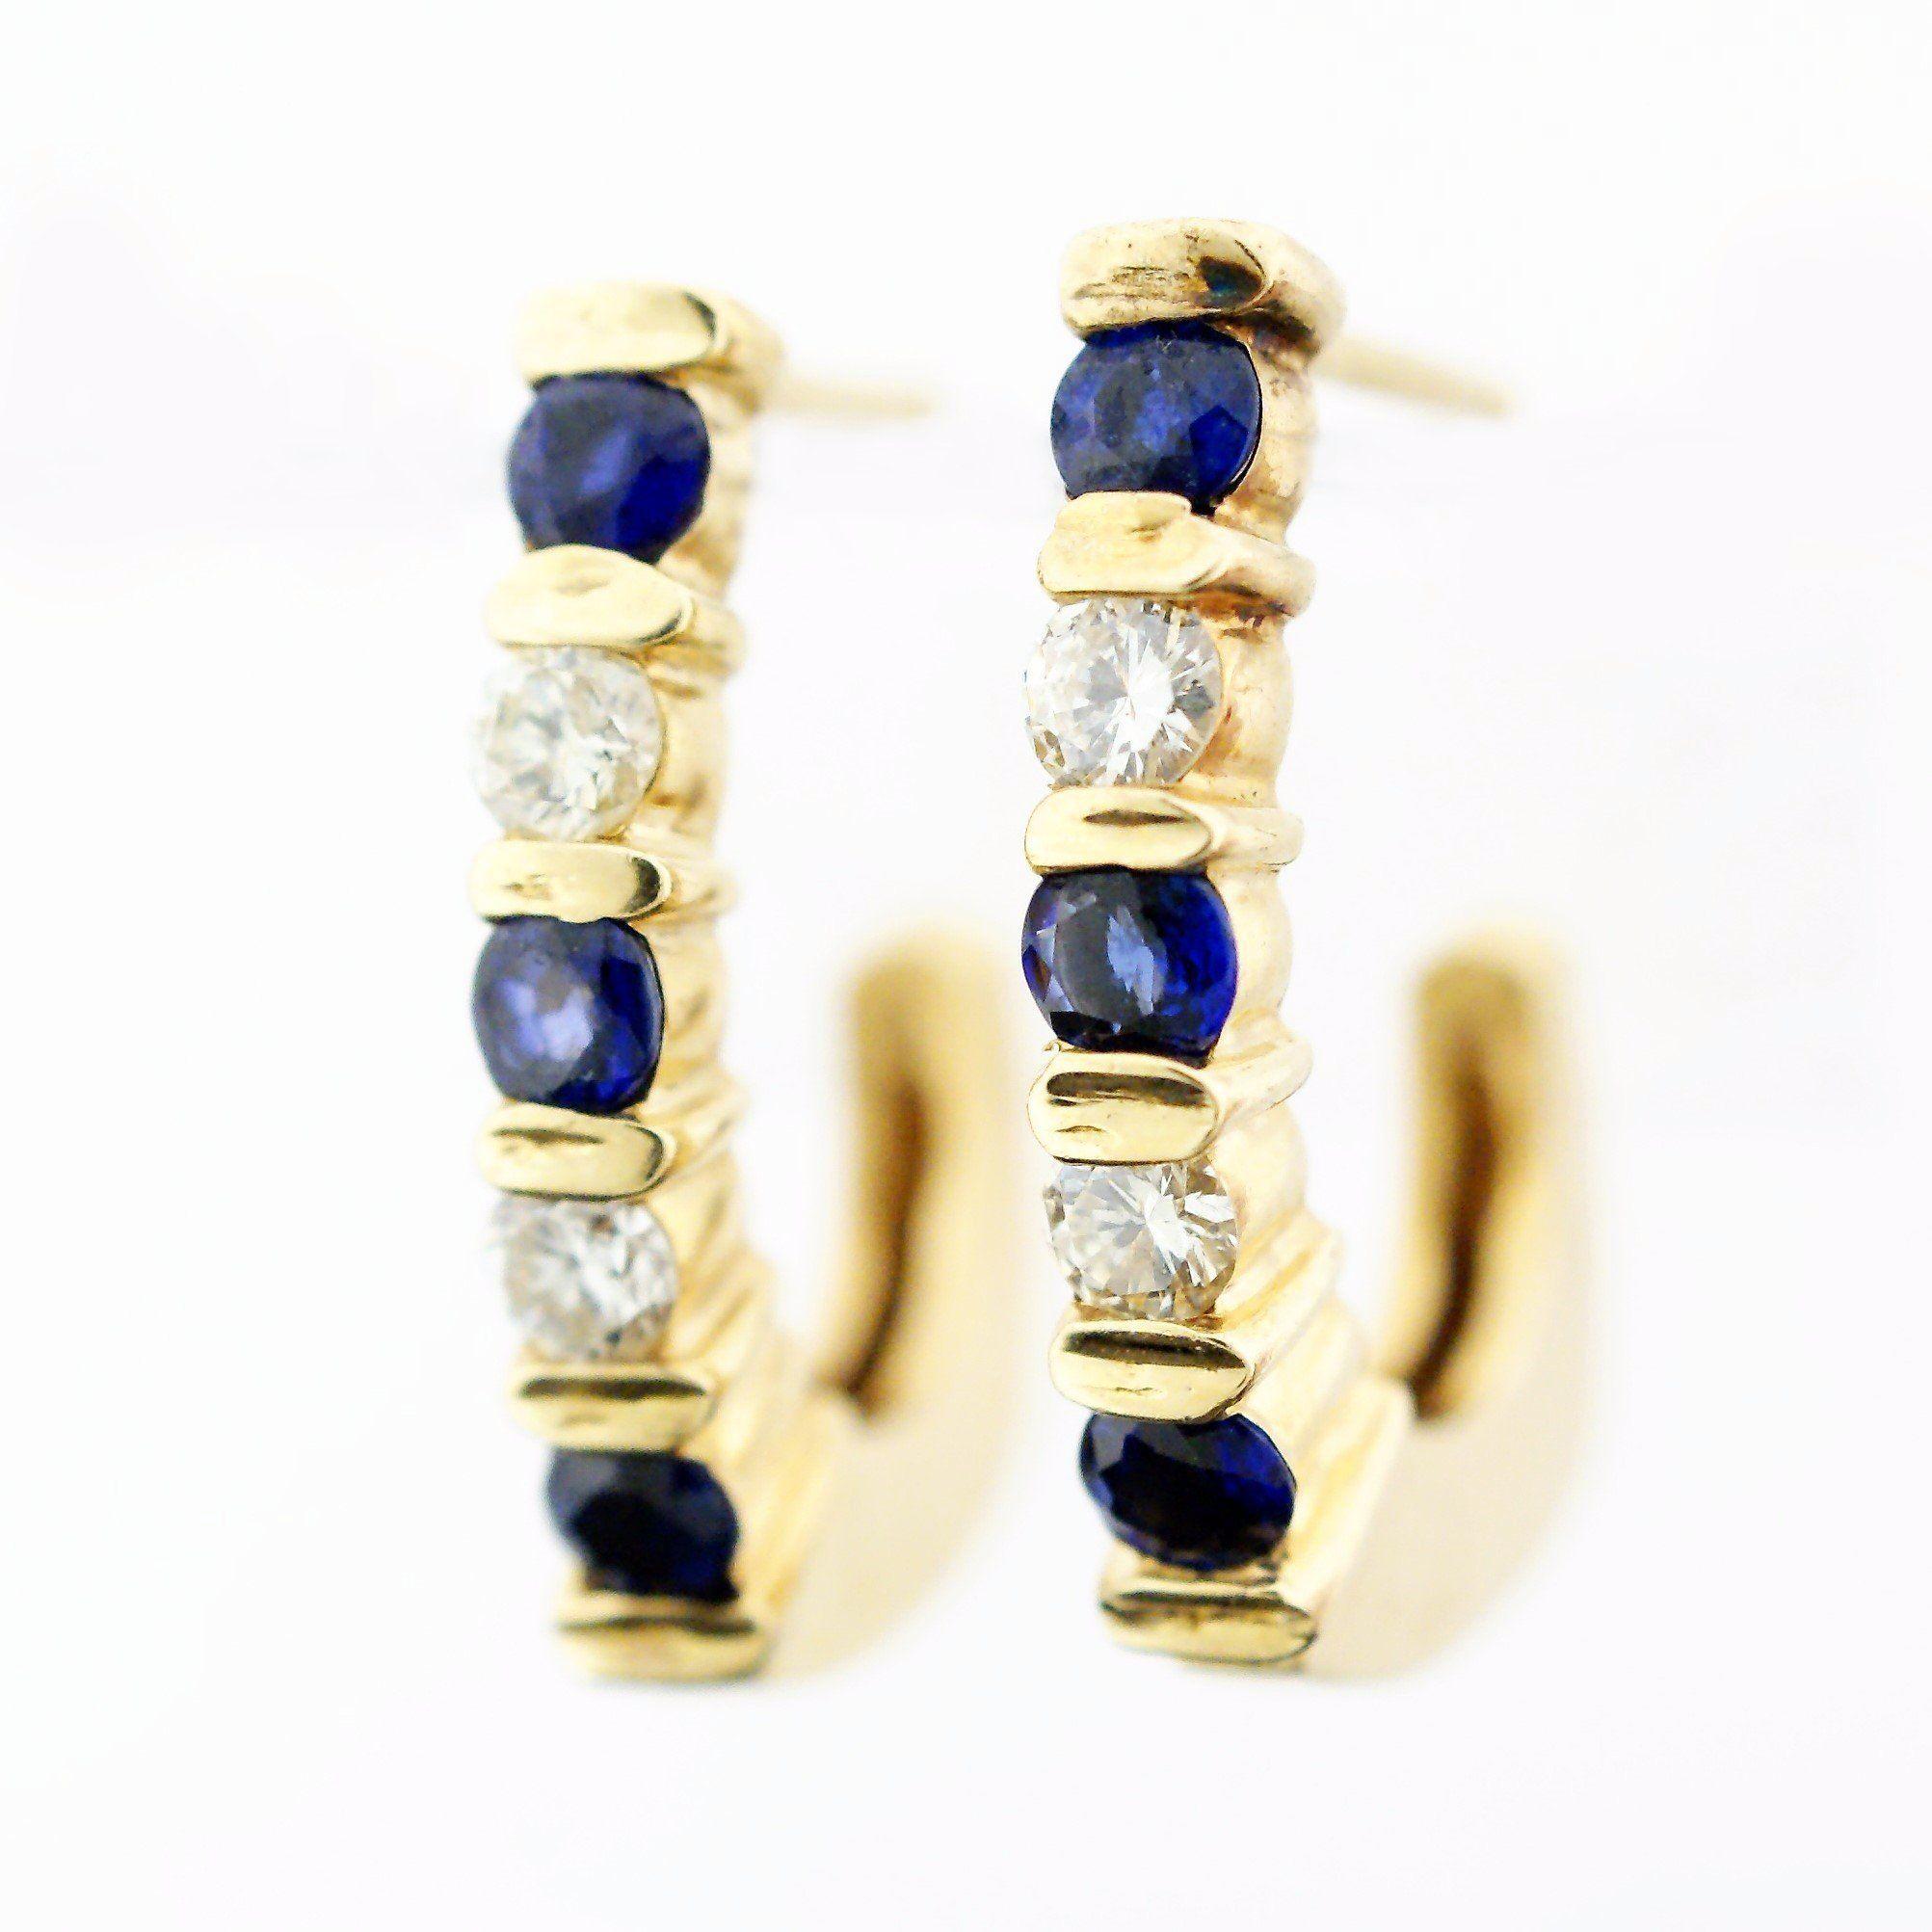 14k Sapphire and Diamond Earrings Popular Jewelry